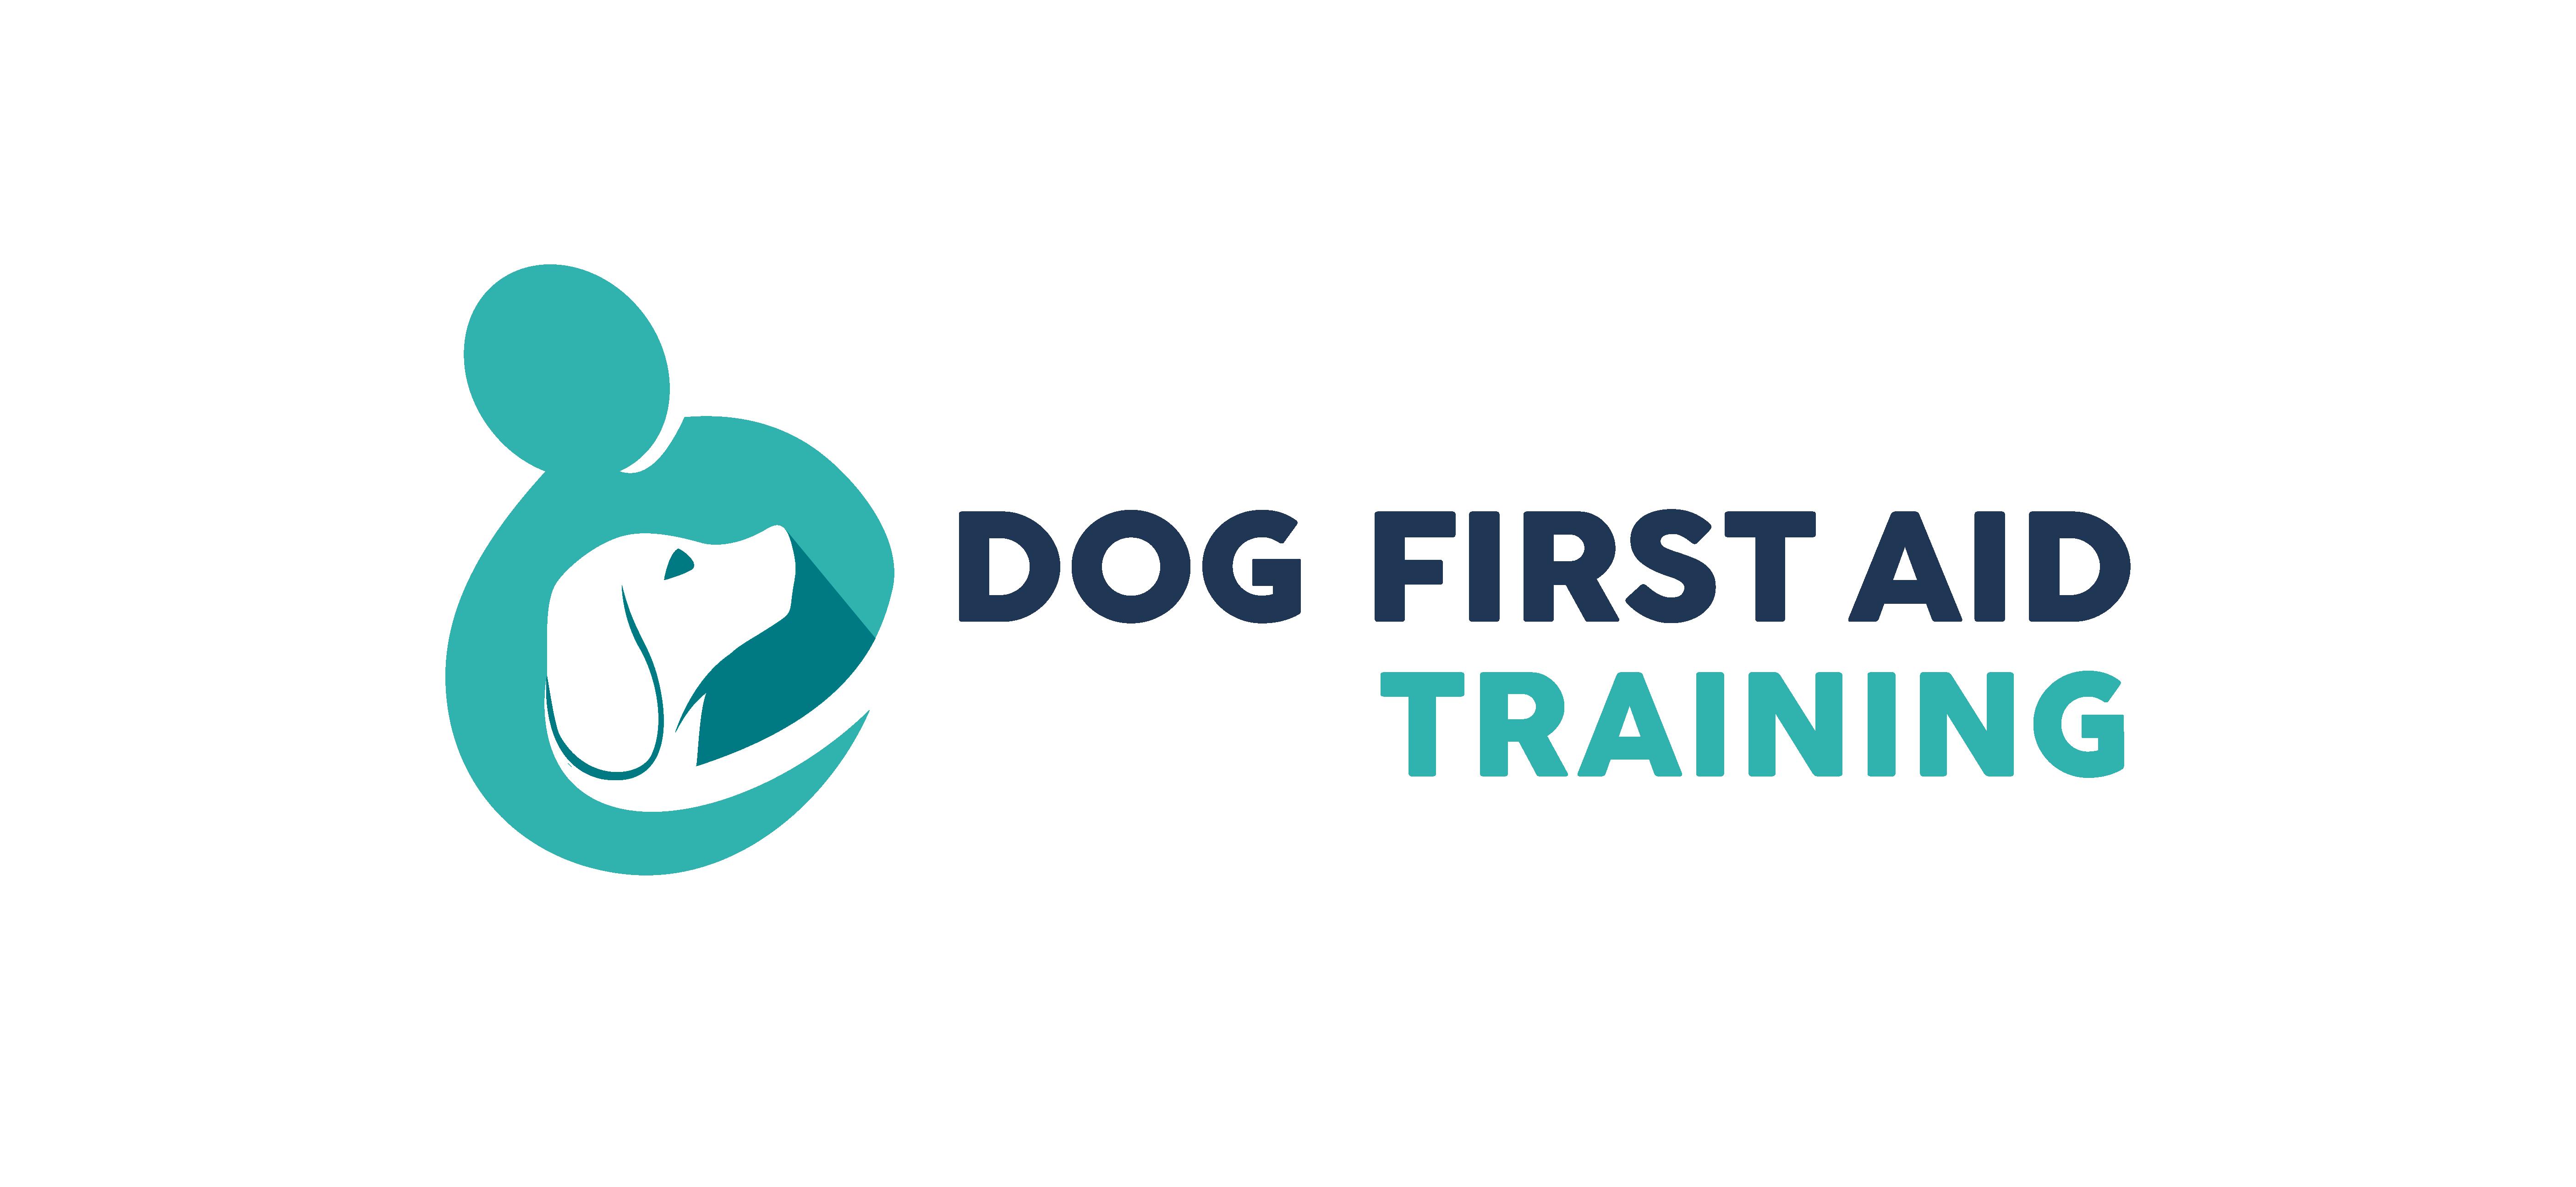 Dog First Aid Logos Horizontal